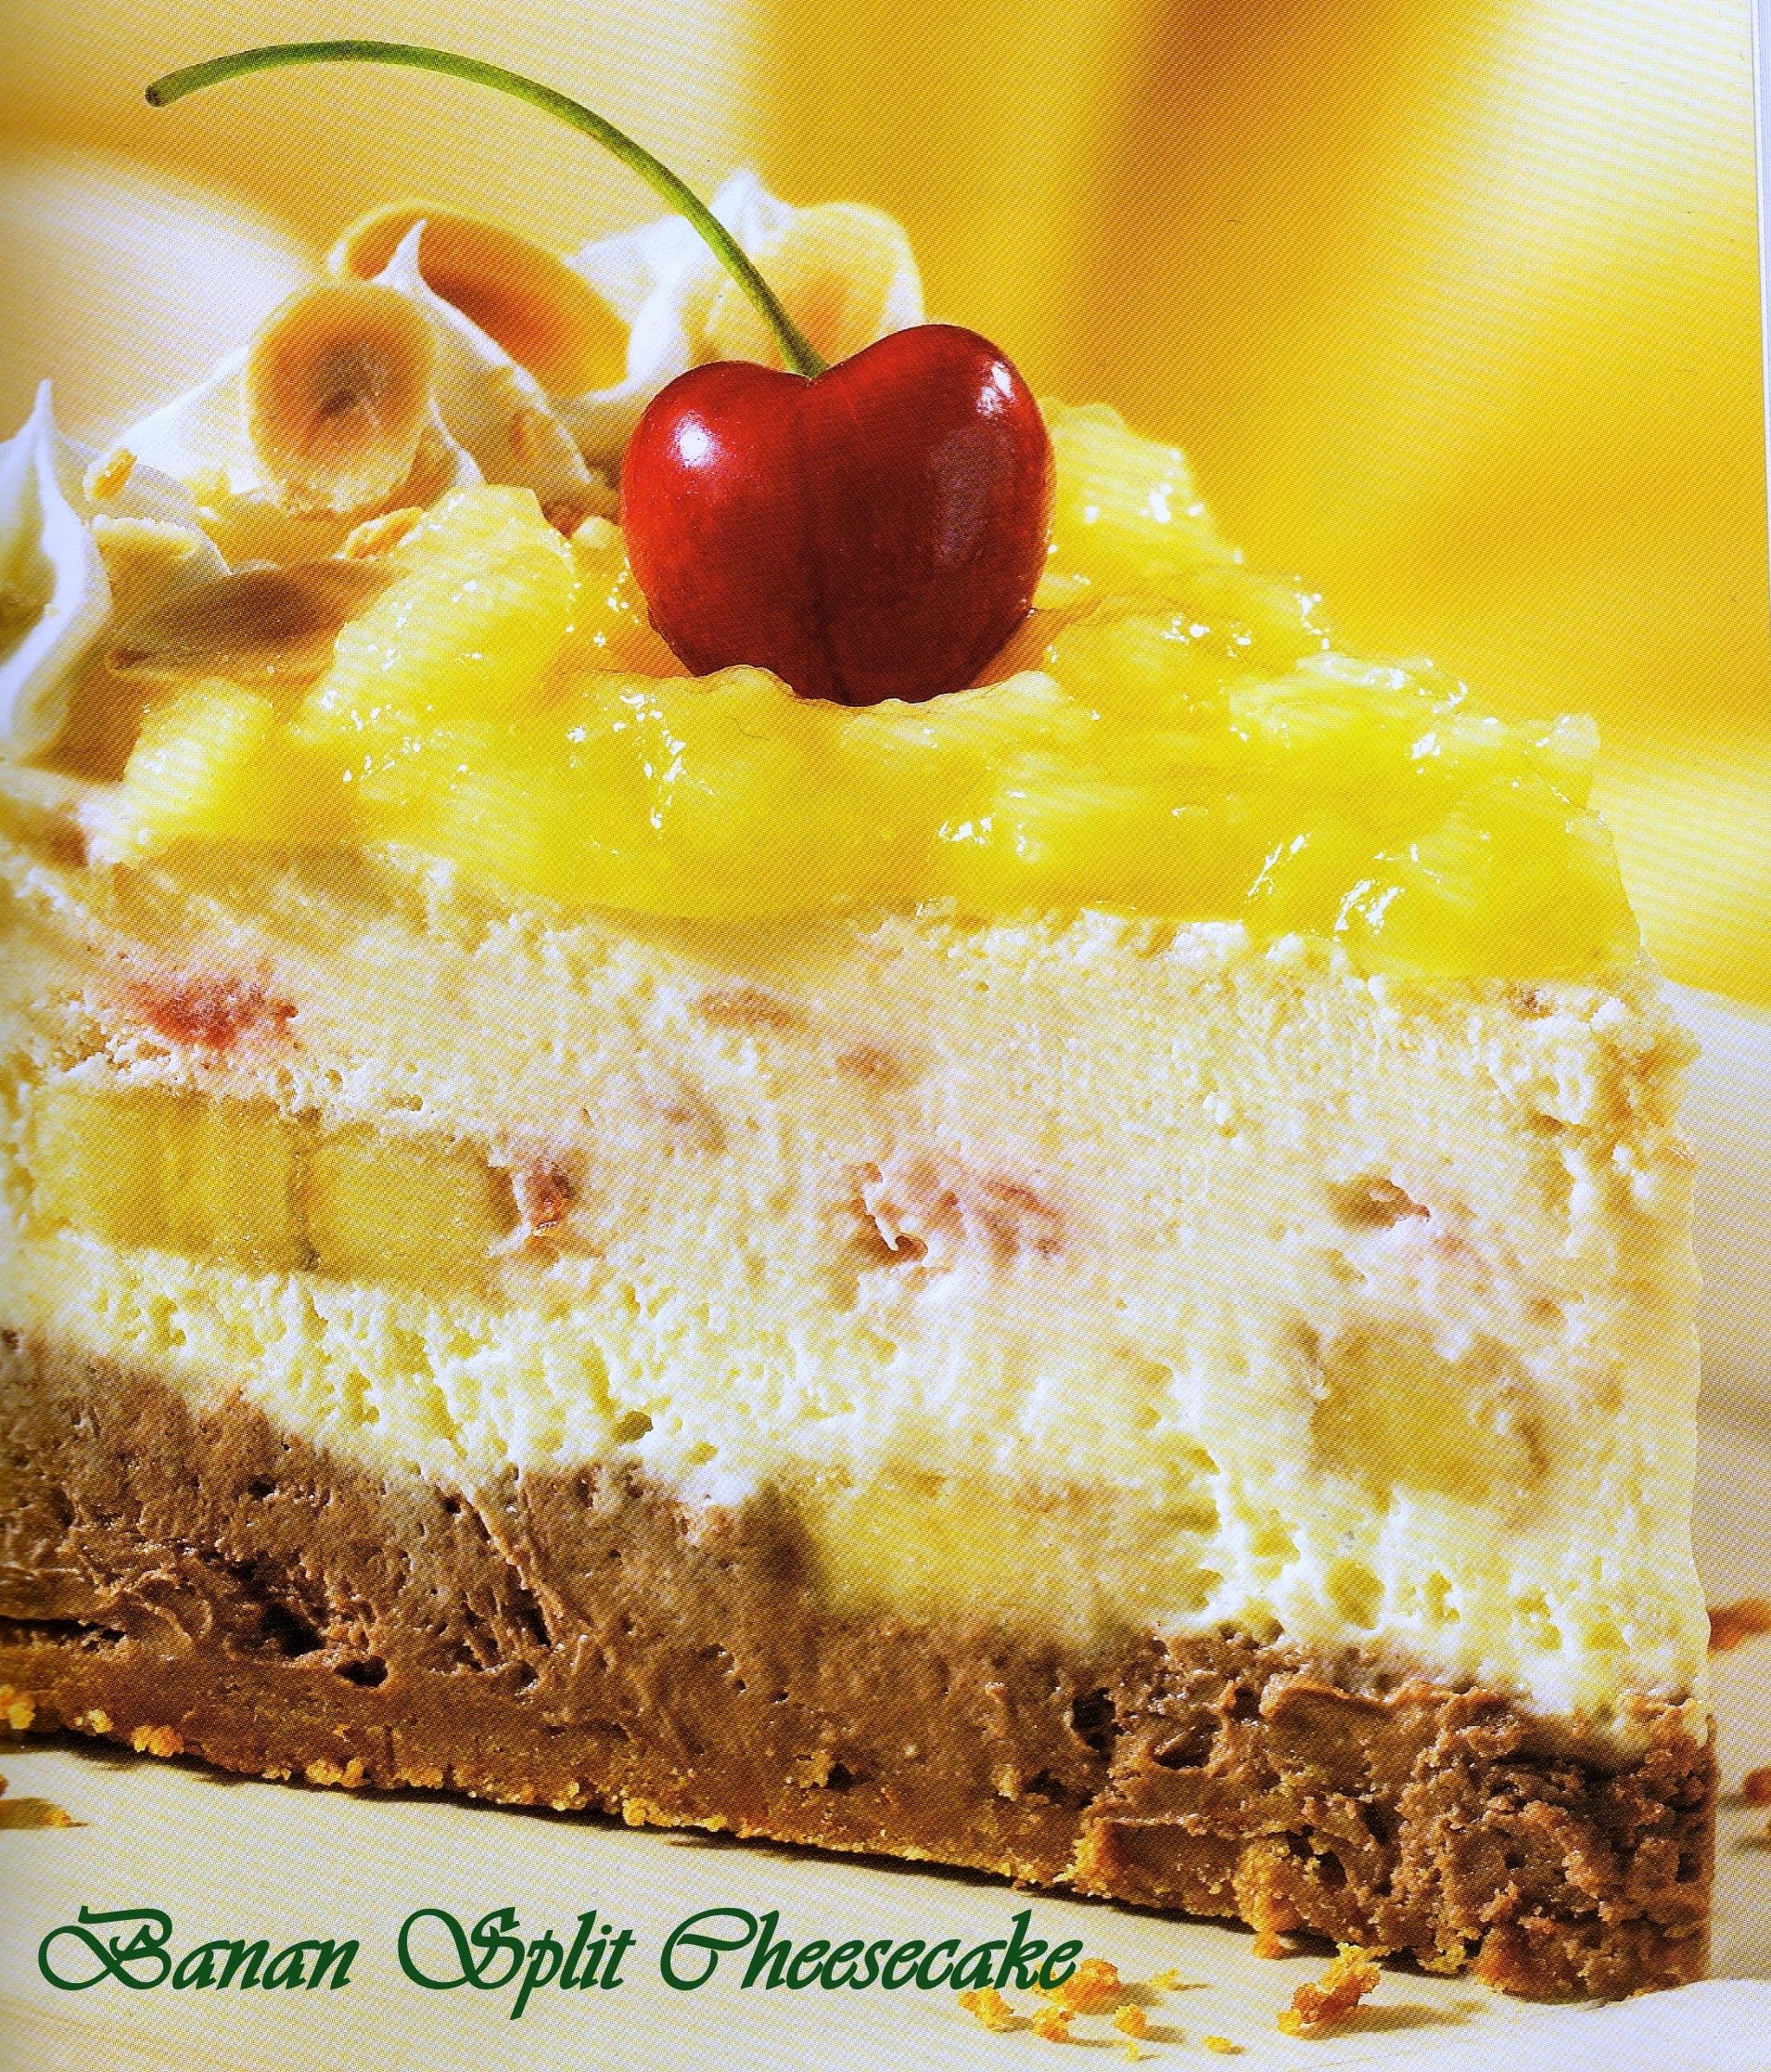 cheesecake utan grädde